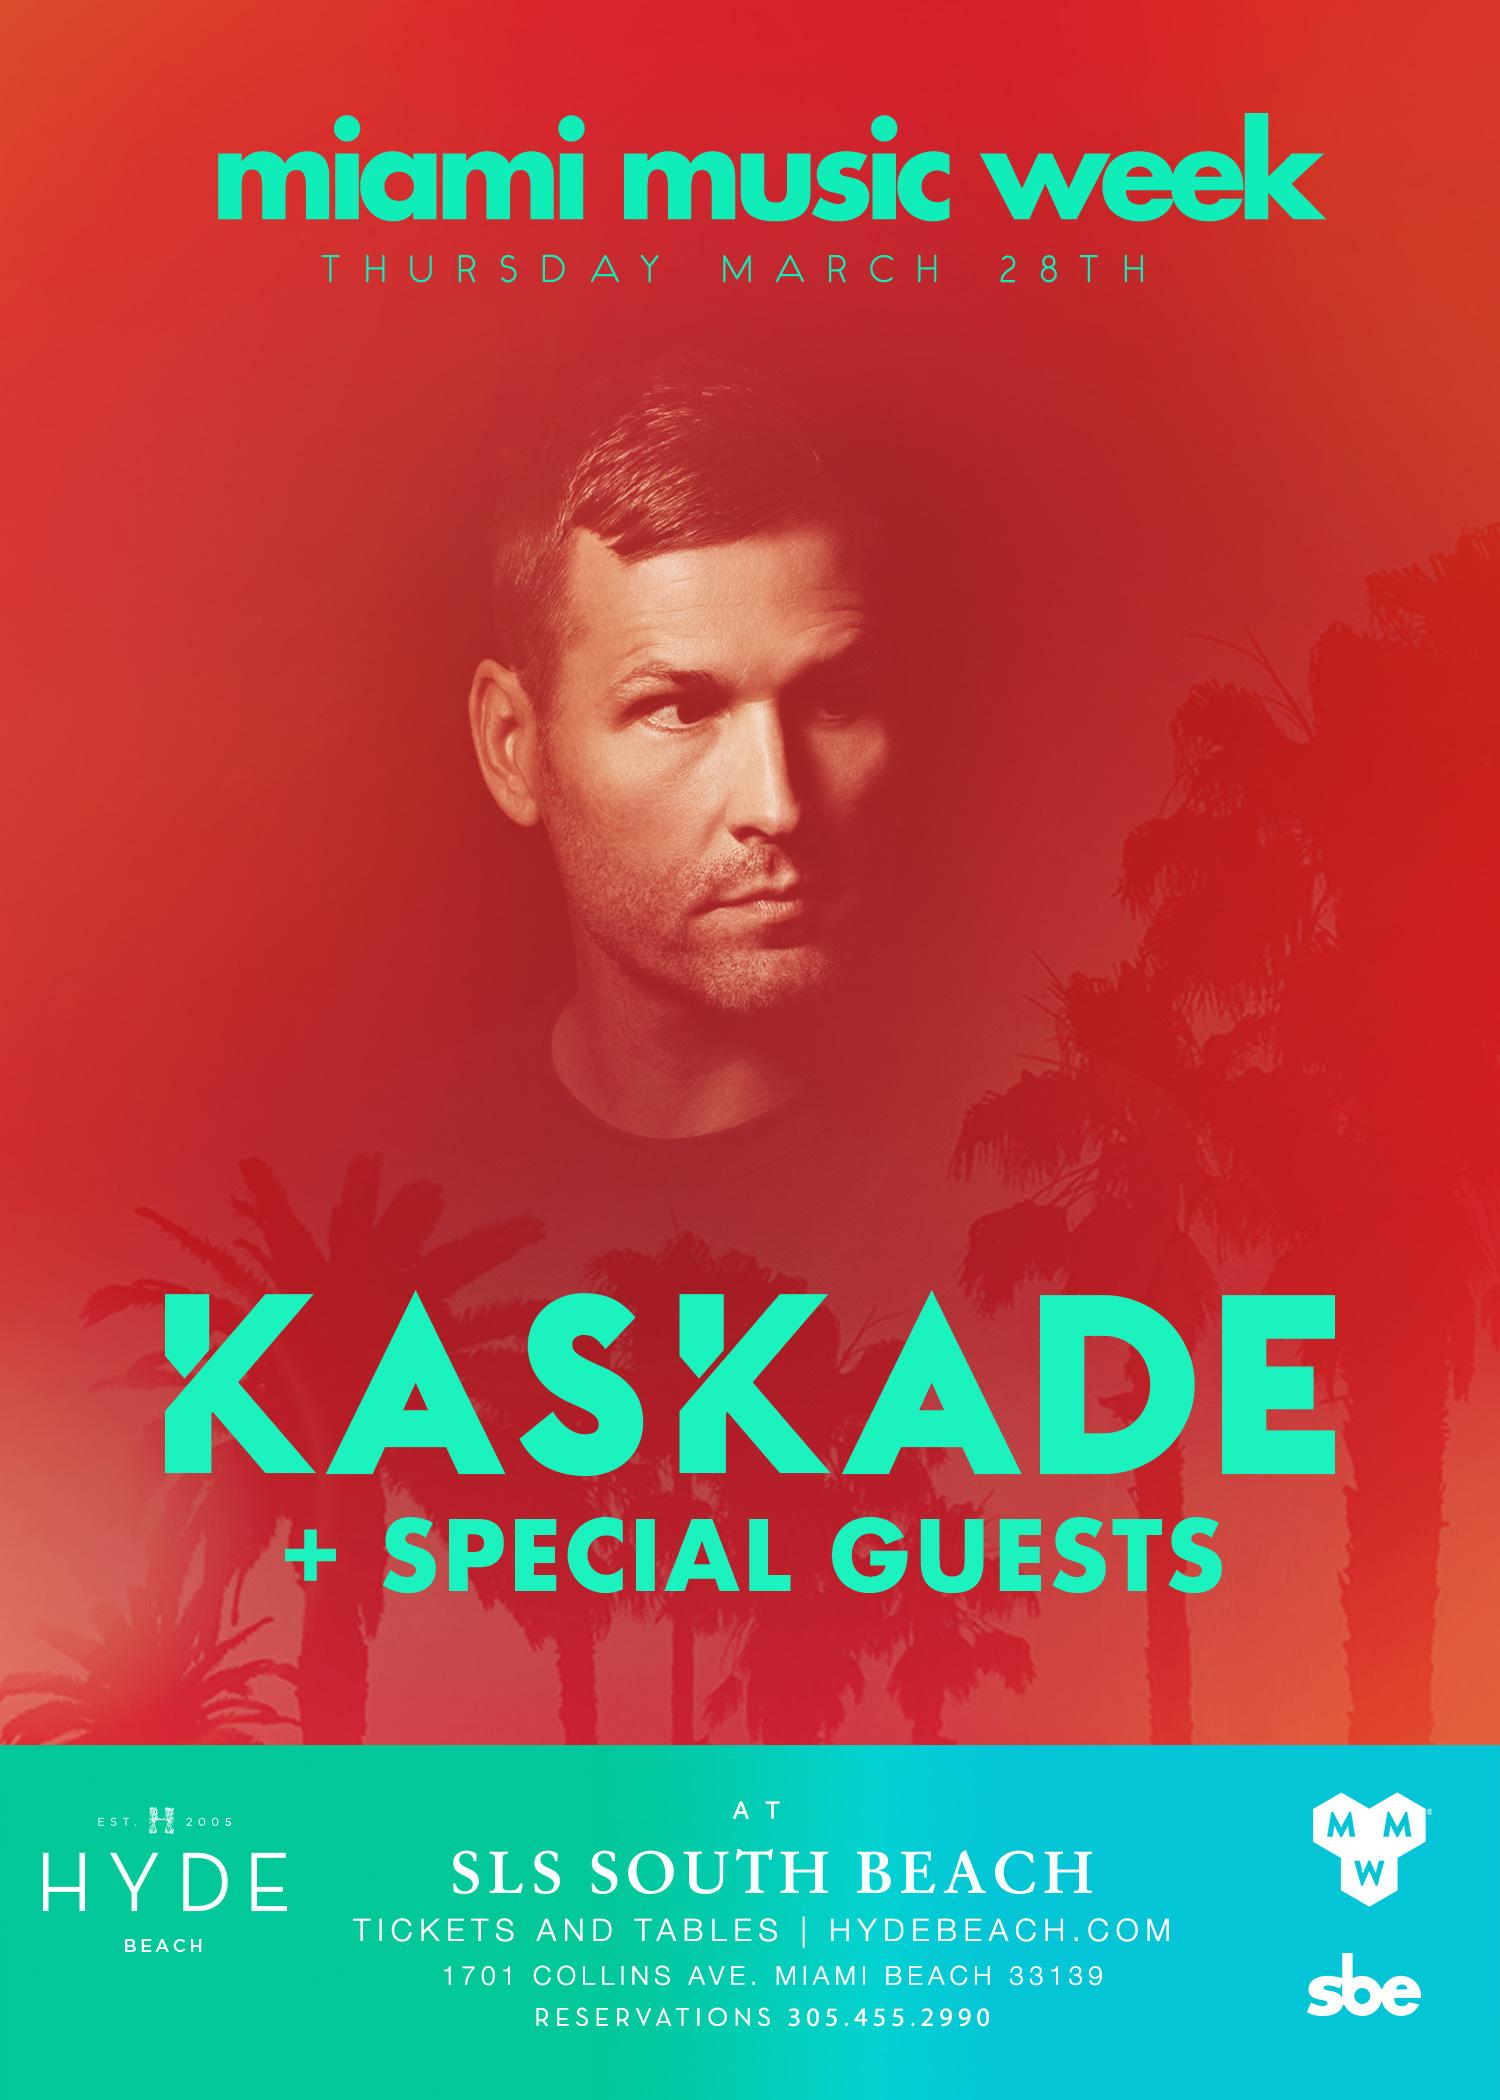 Miami Music Week 2019 - KASKADE + FRIENDS Image